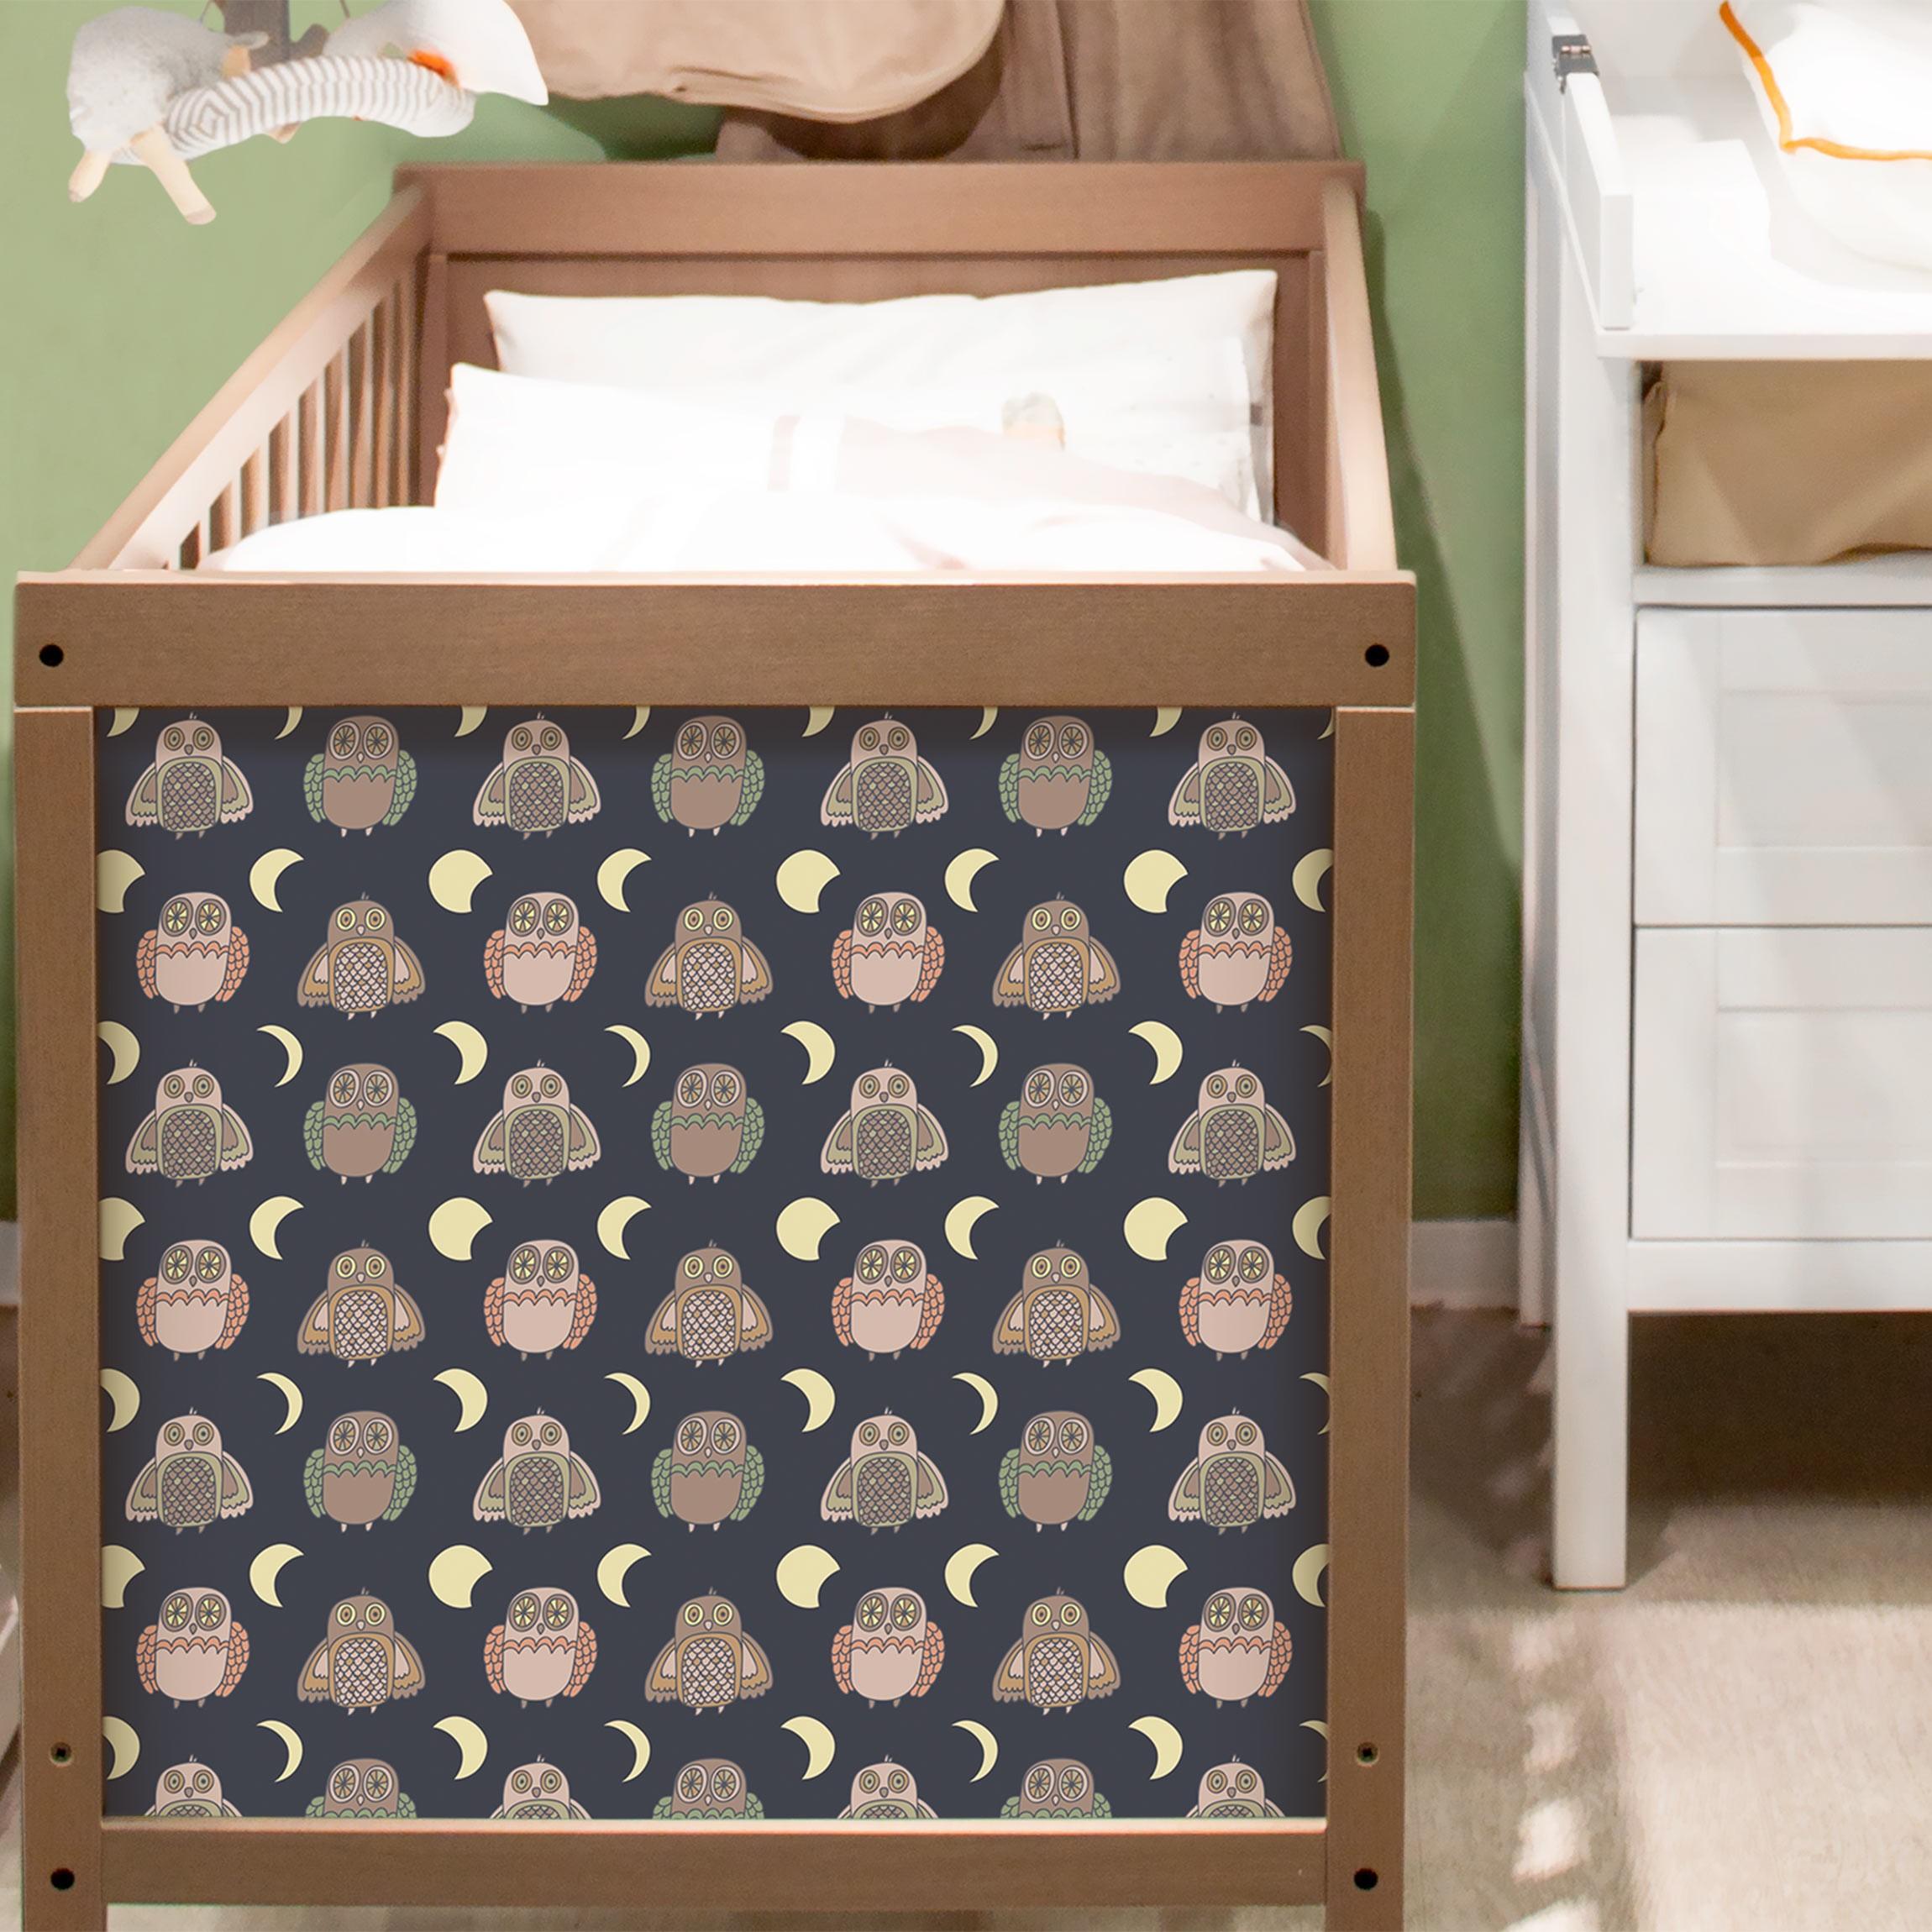 m belfolie nachteulen muster mit mondphasen klebefolie. Black Bedroom Furniture Sets. Home Design Ideas